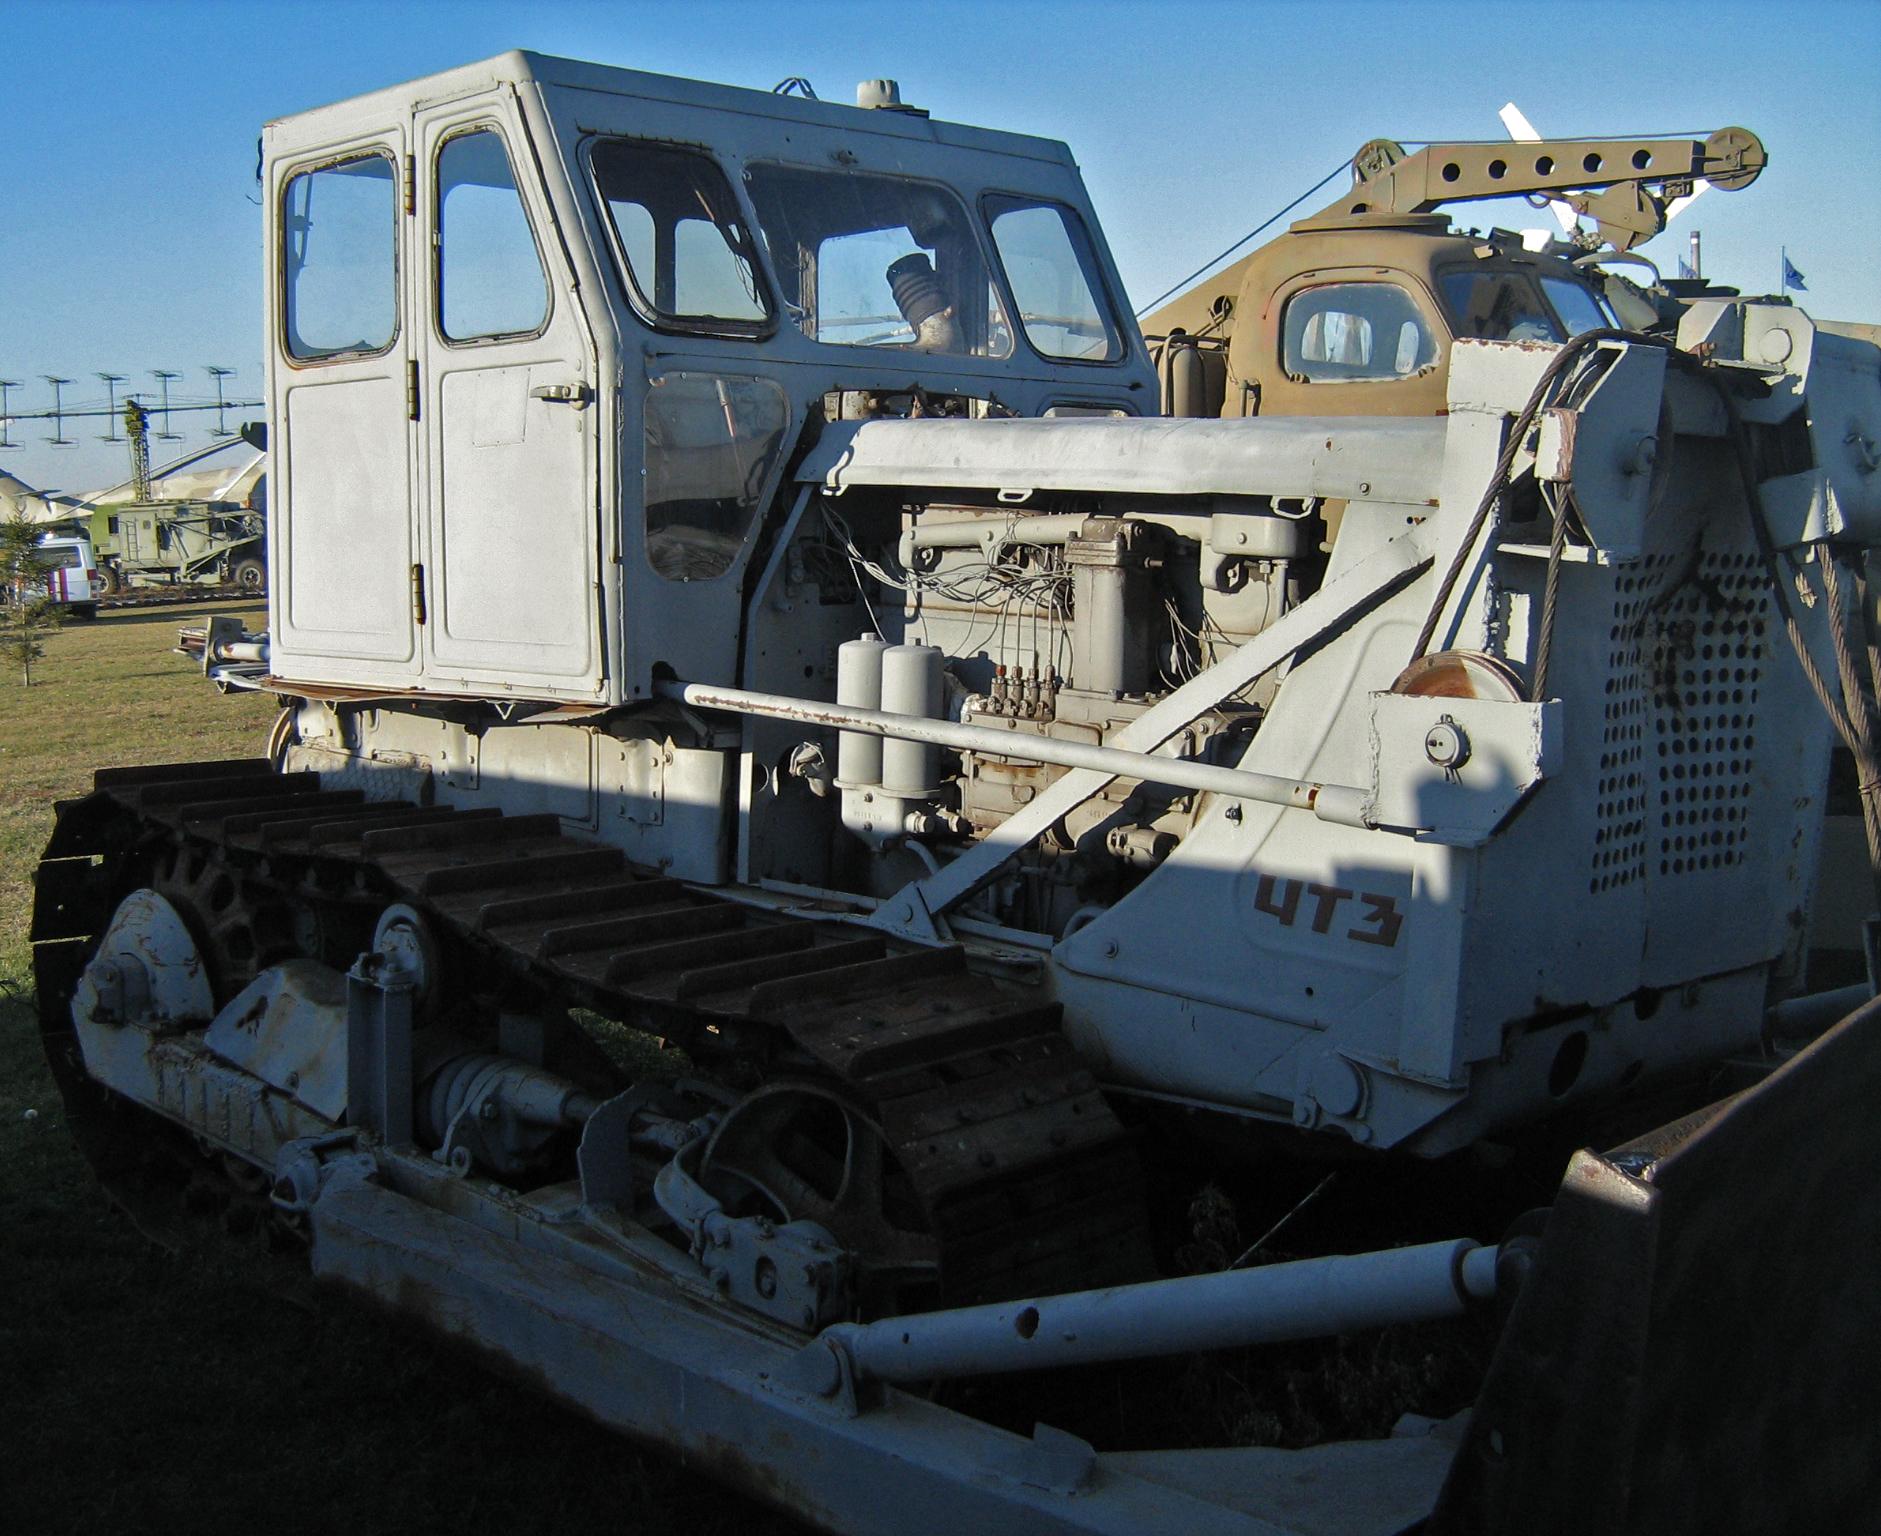 File:Трактор ЧТЗ-2.jpg - Wikimedia Commons